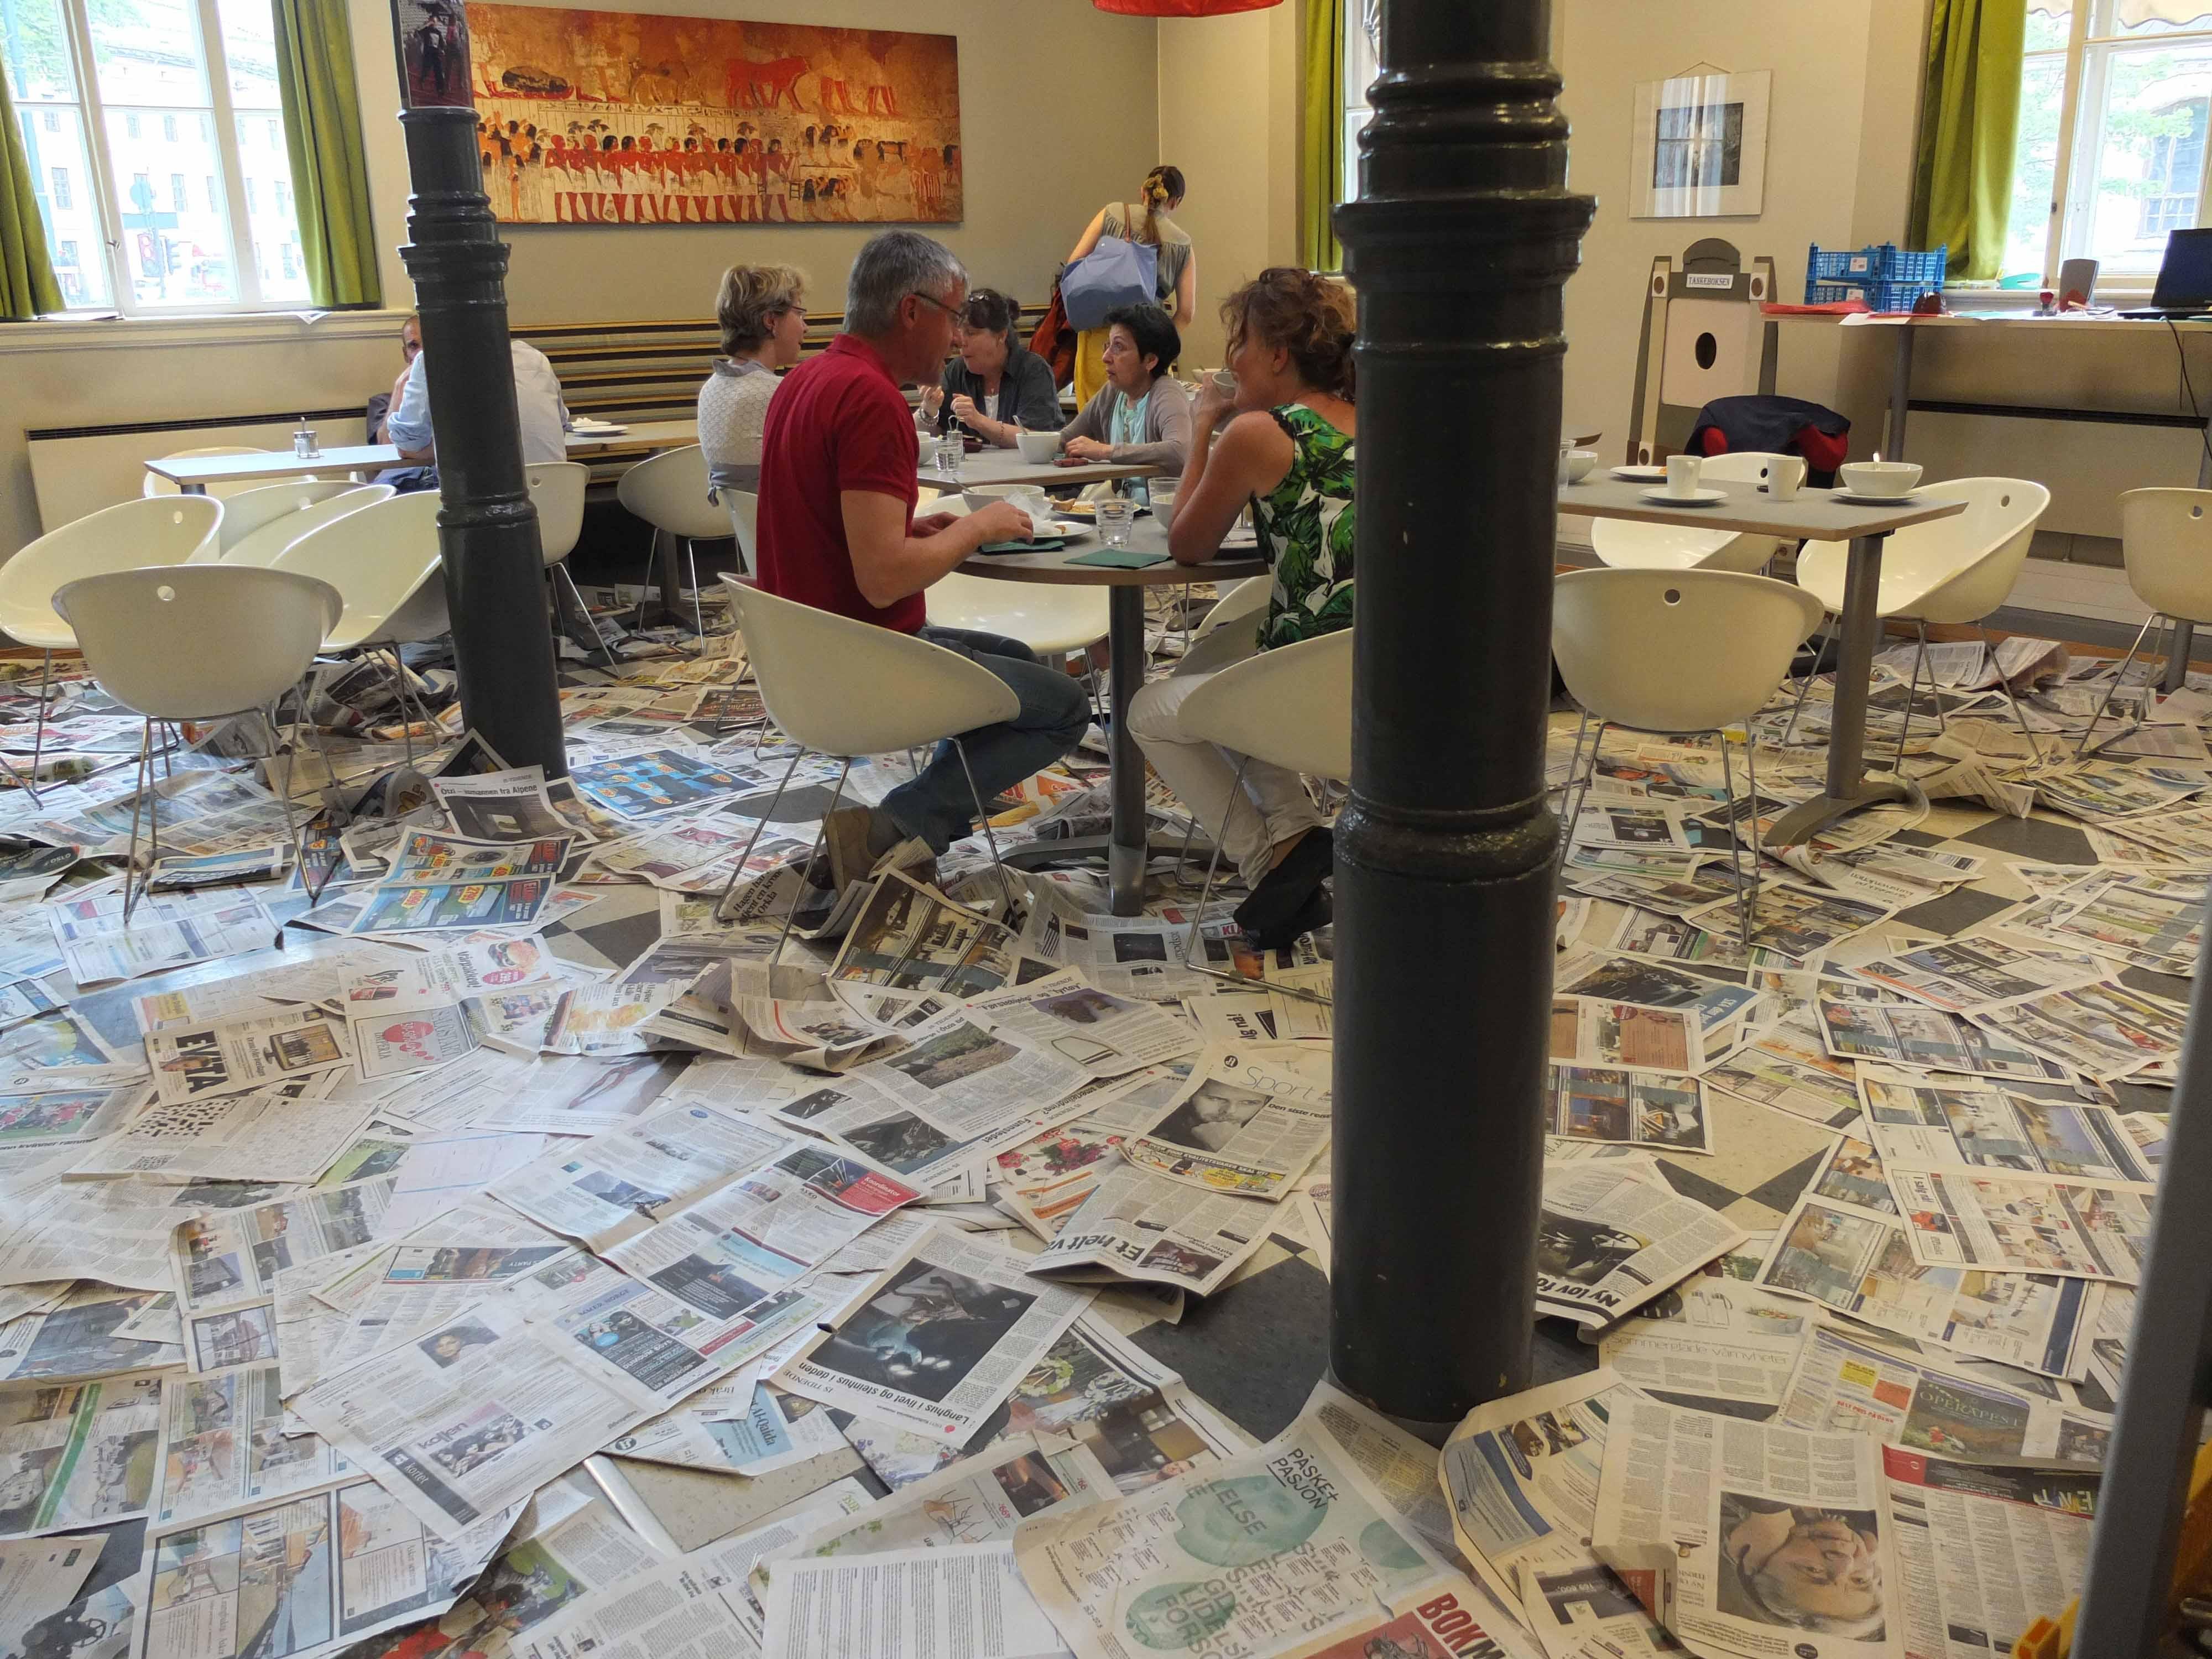 2014 destruction accumulation 02 08